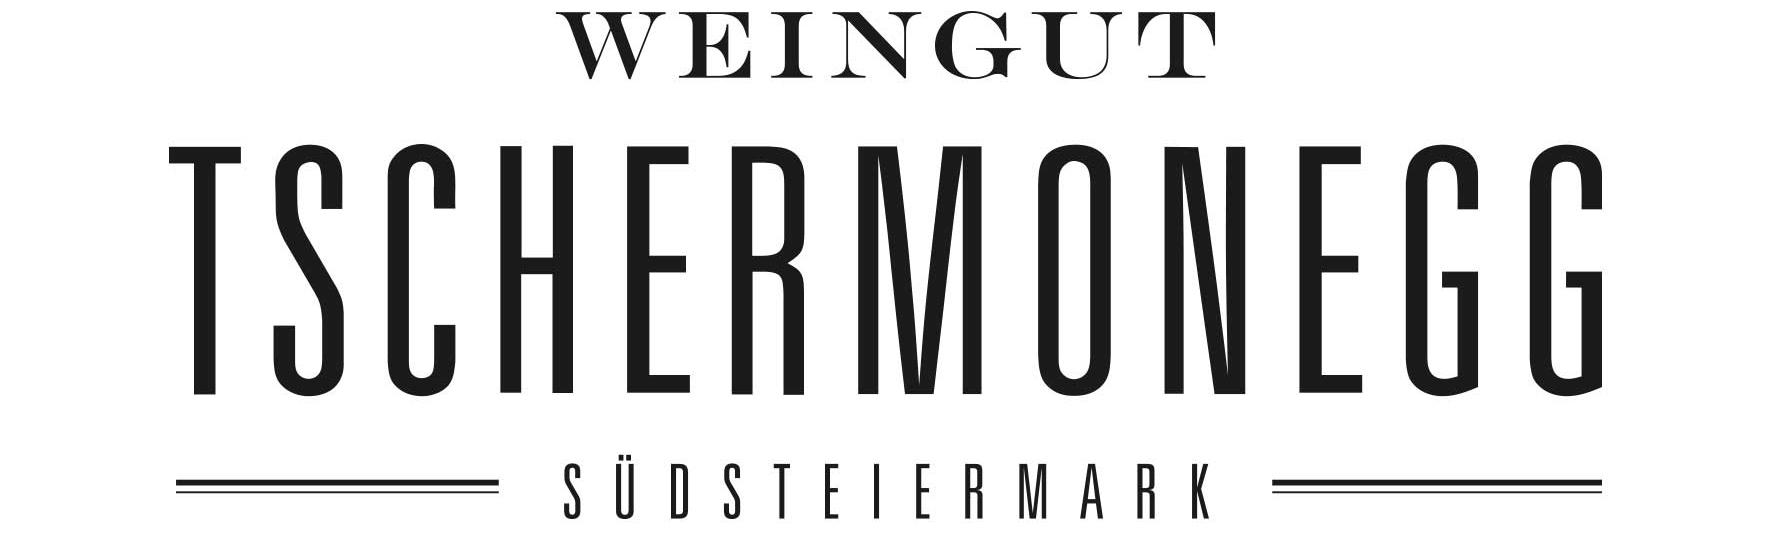 Weingut Tschermonegg Logo